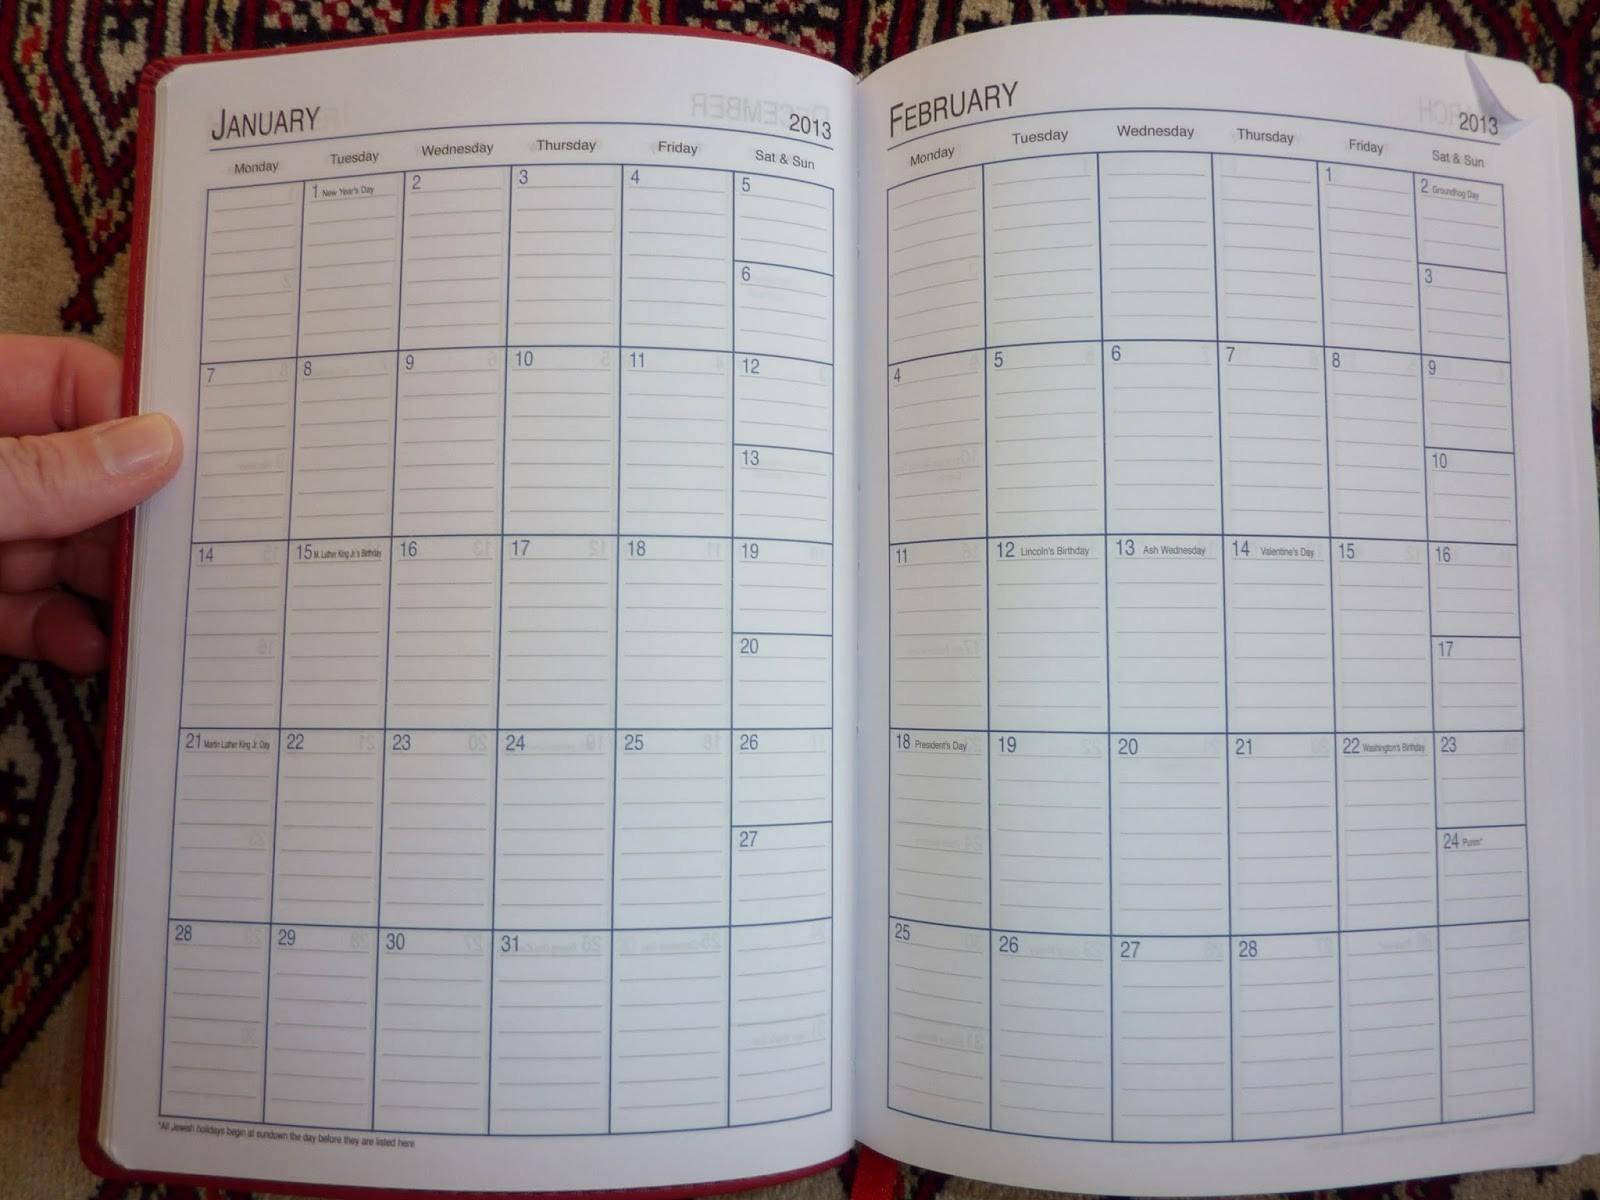 Calendar One Day Per Page Unique Plannerisms the Showdown Day Per Page Diary Vs Undated